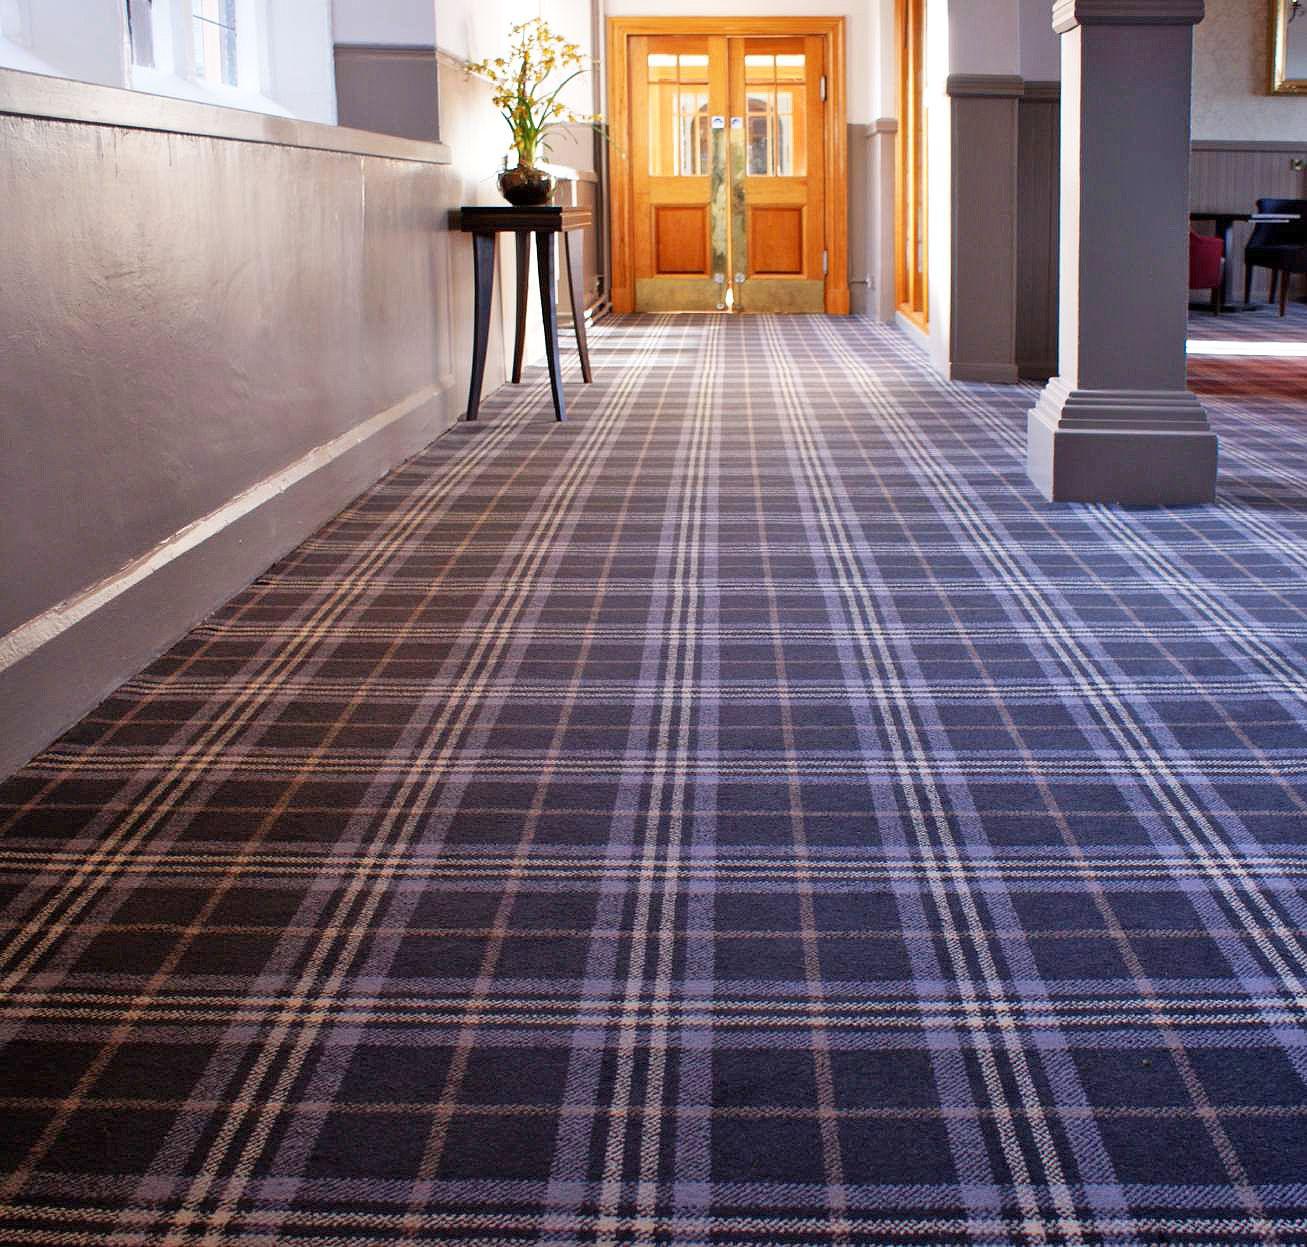 Hotel Decor Tartan Carpet Interior Design Stirling Scotland Flooring Design Traditional Style Bar Decor R Buying Carpet Stair Runner Carpet Hotel Carpet